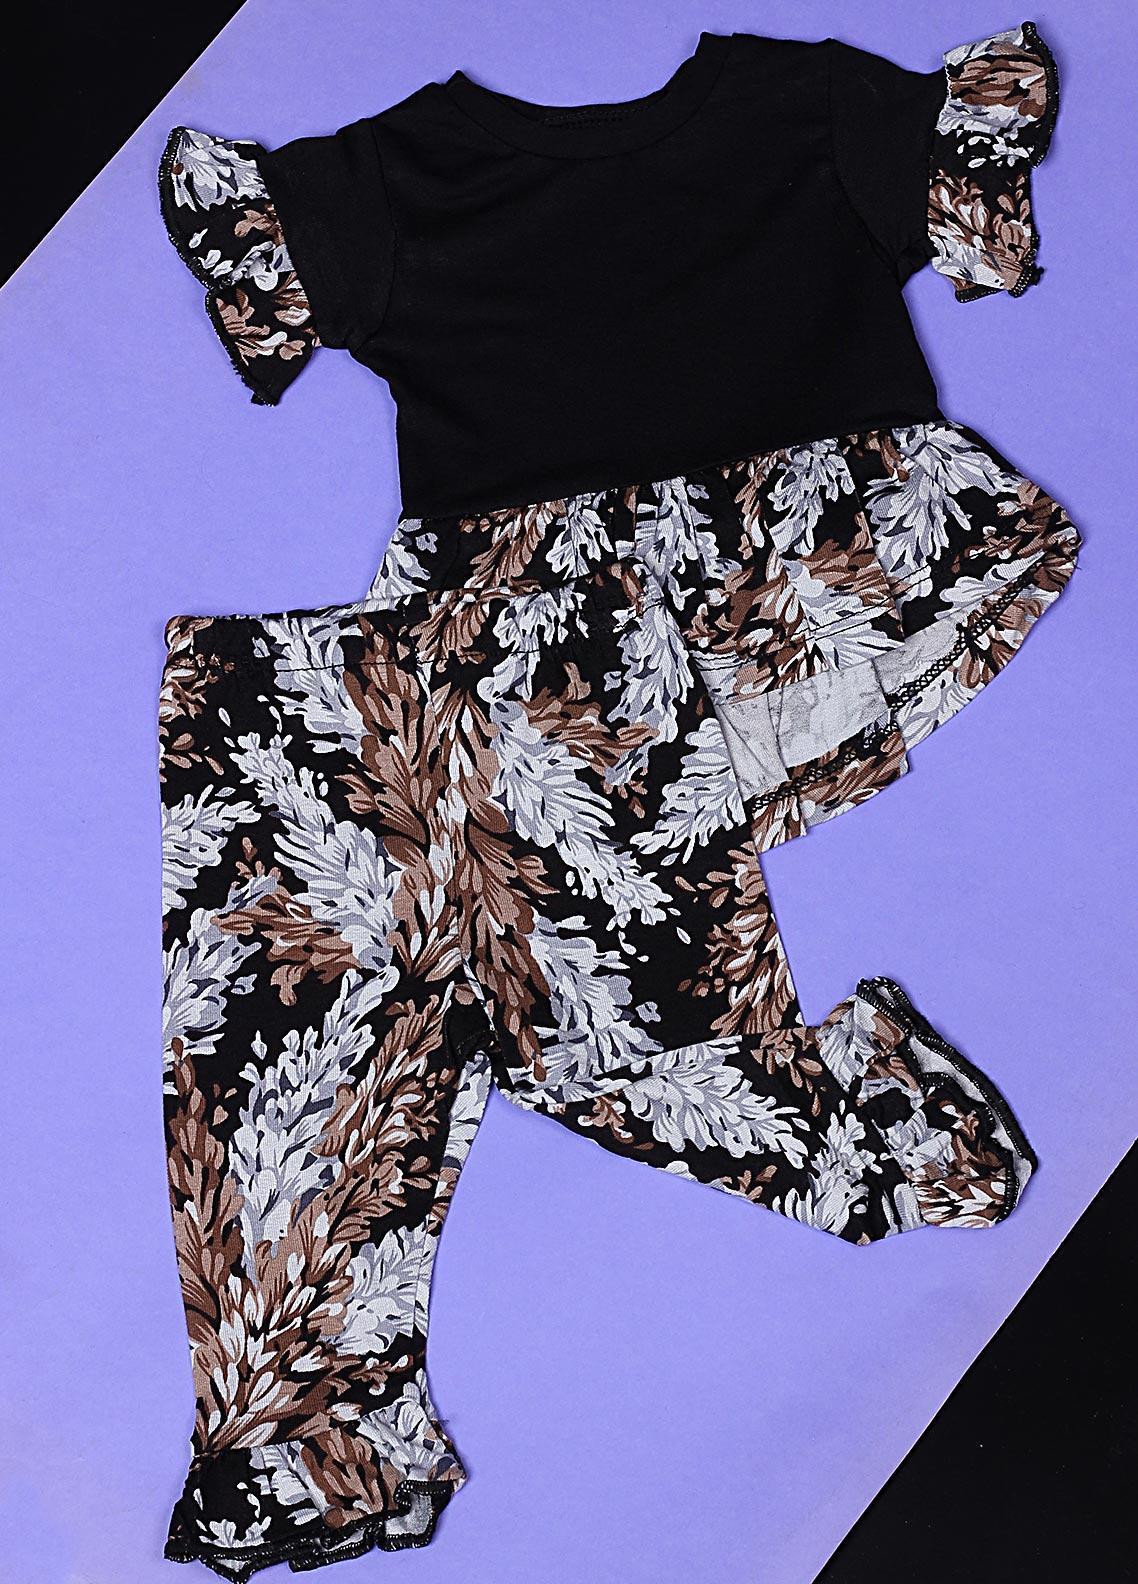 Sanaulla Exclusive Range Cotton Casual Girls Suit -  22595-3 Black/Grey